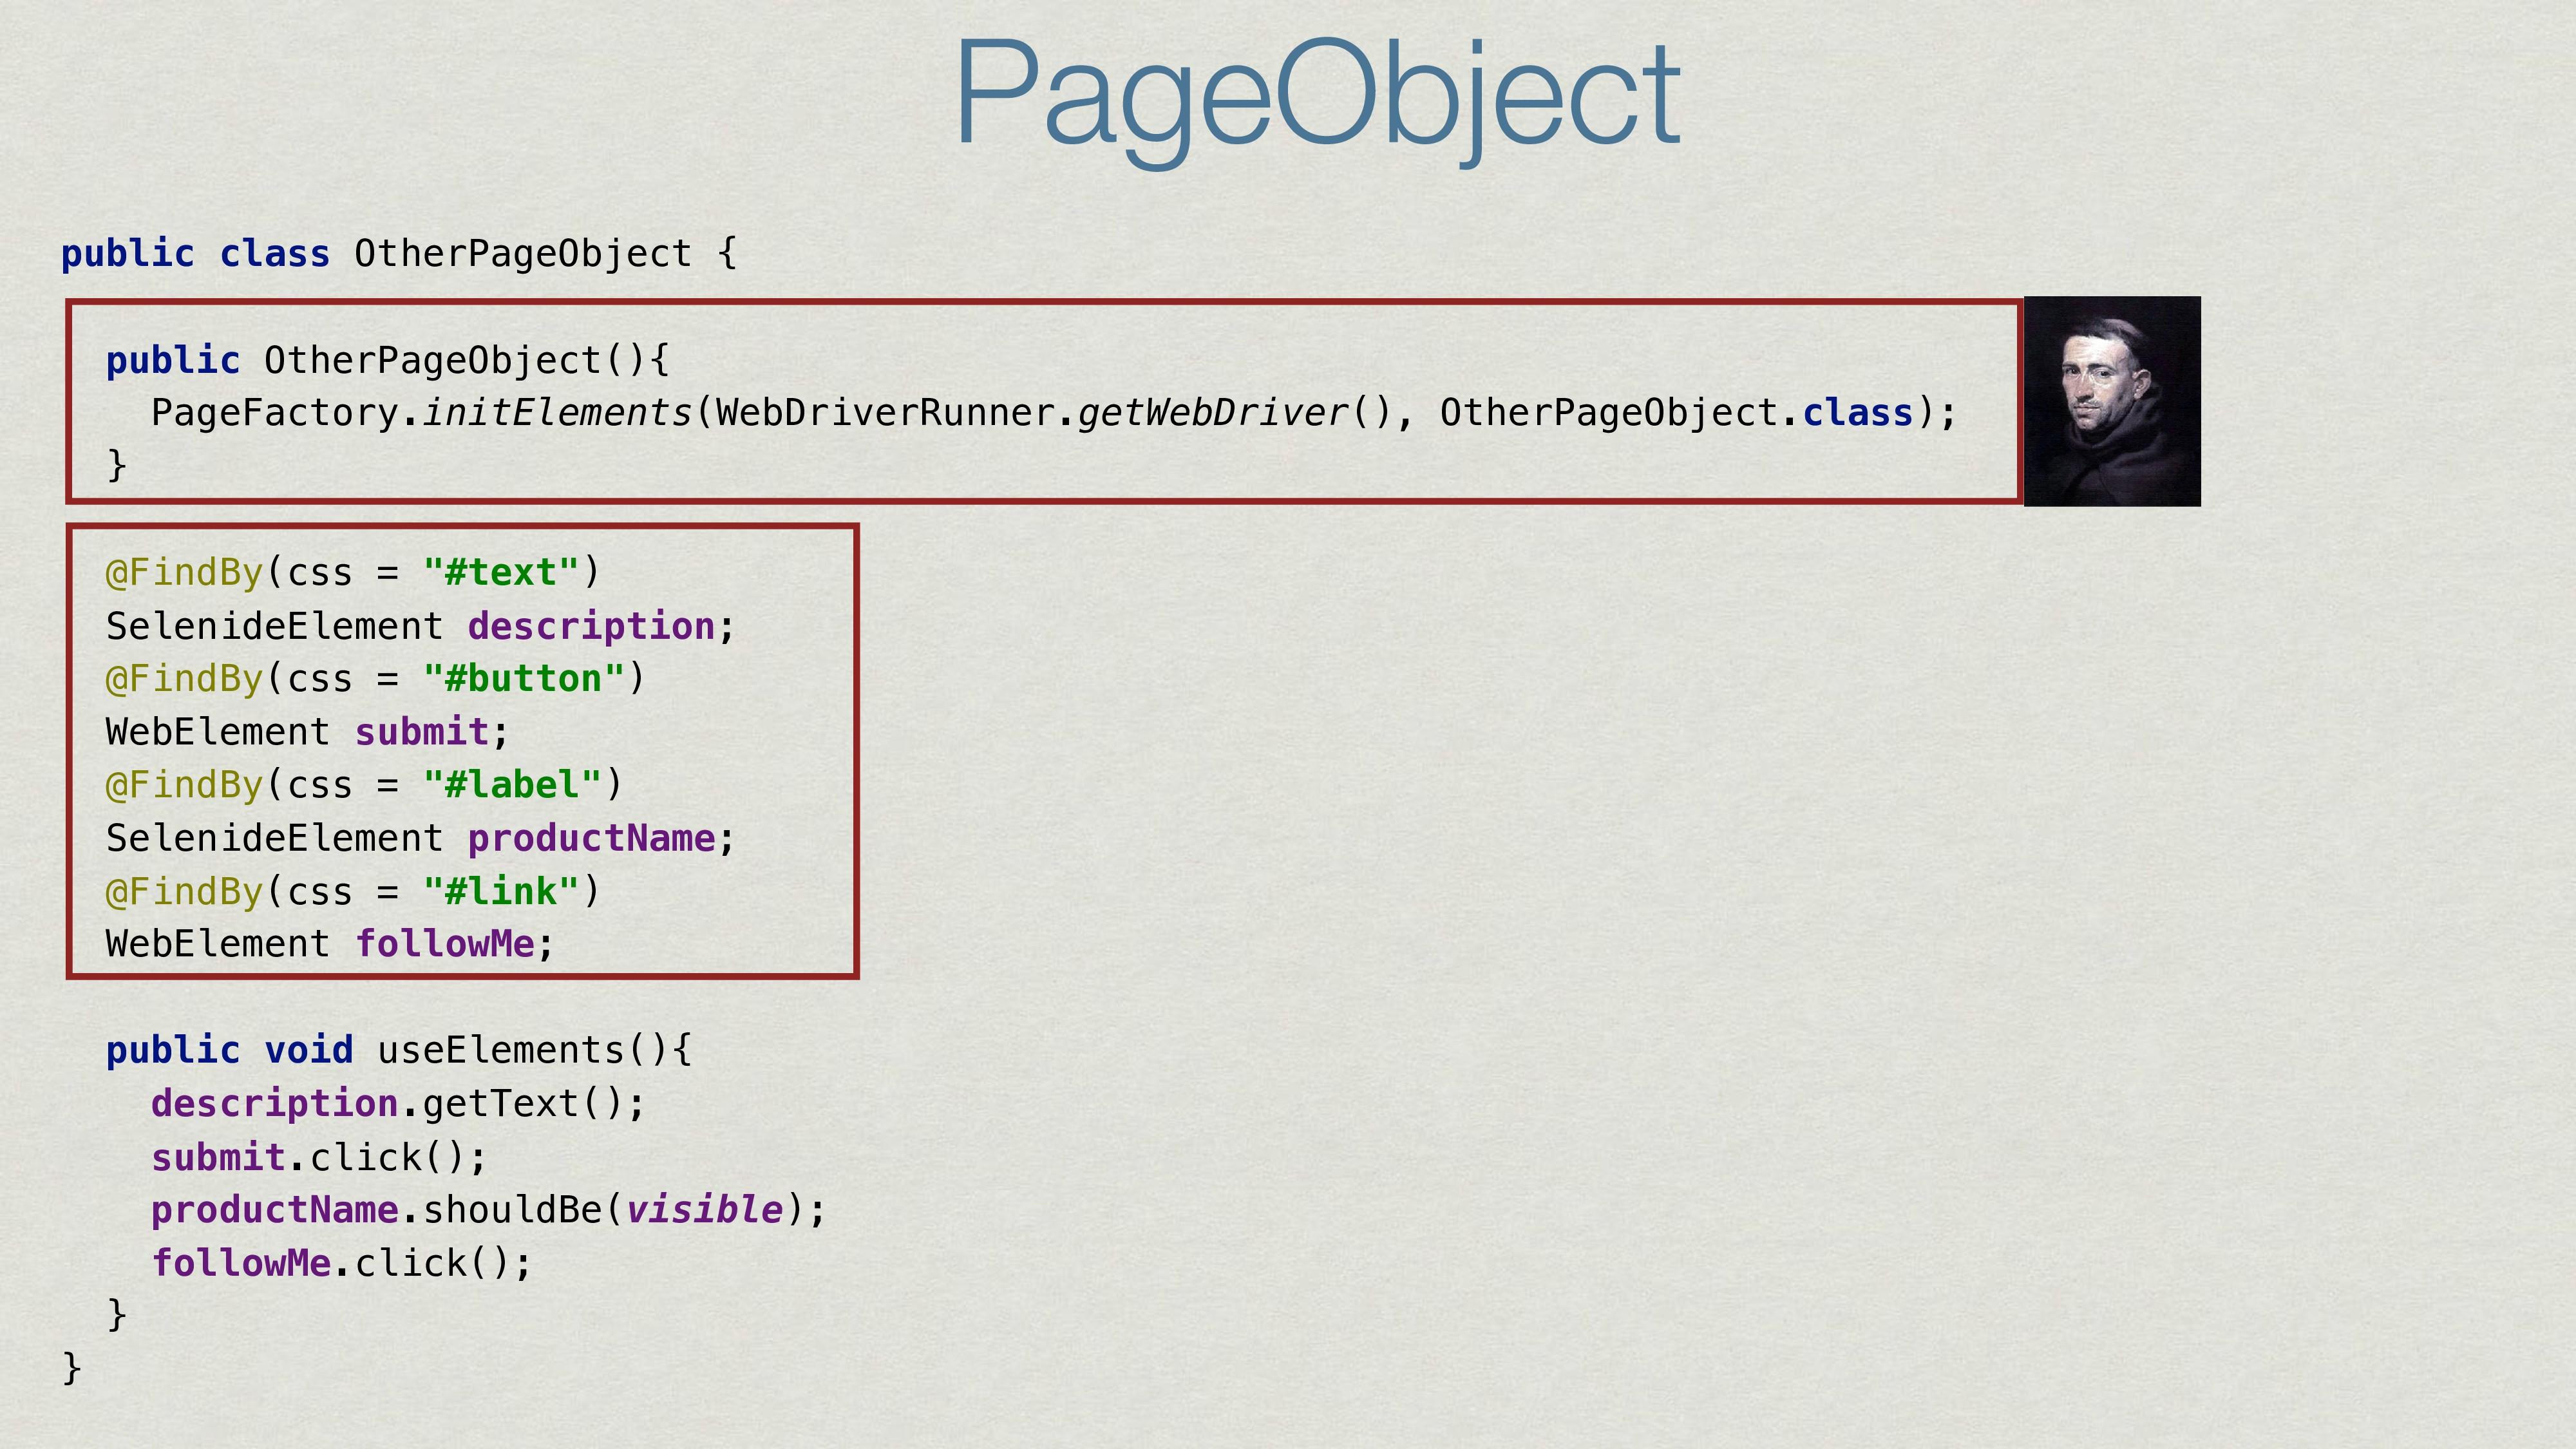 PageObject public class OtherPageObject { publi...